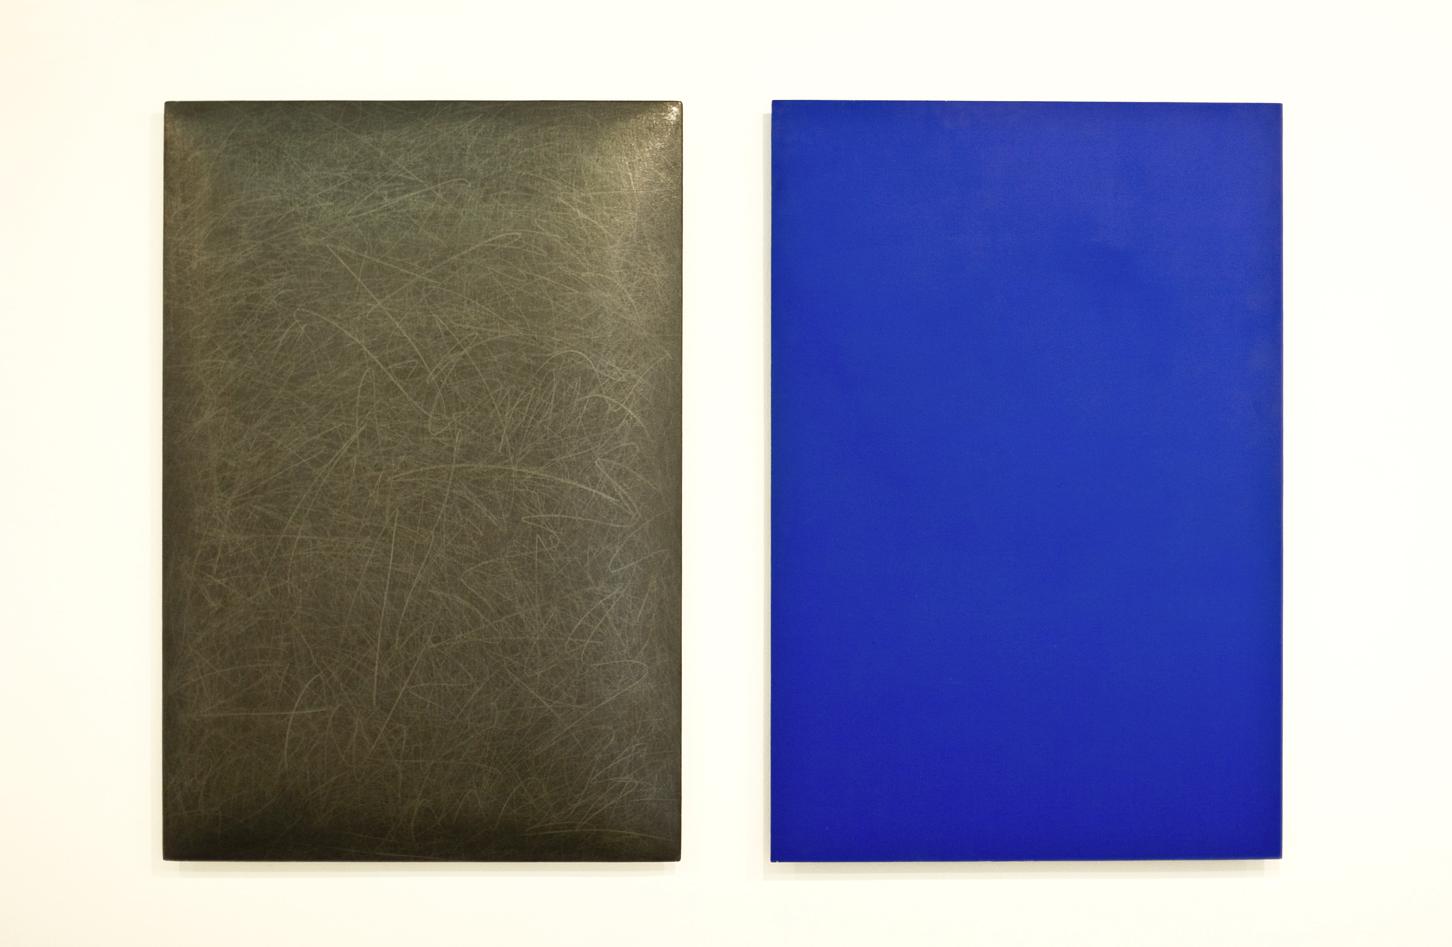 grafit, akril, les, 100 x 70 cm, 1999